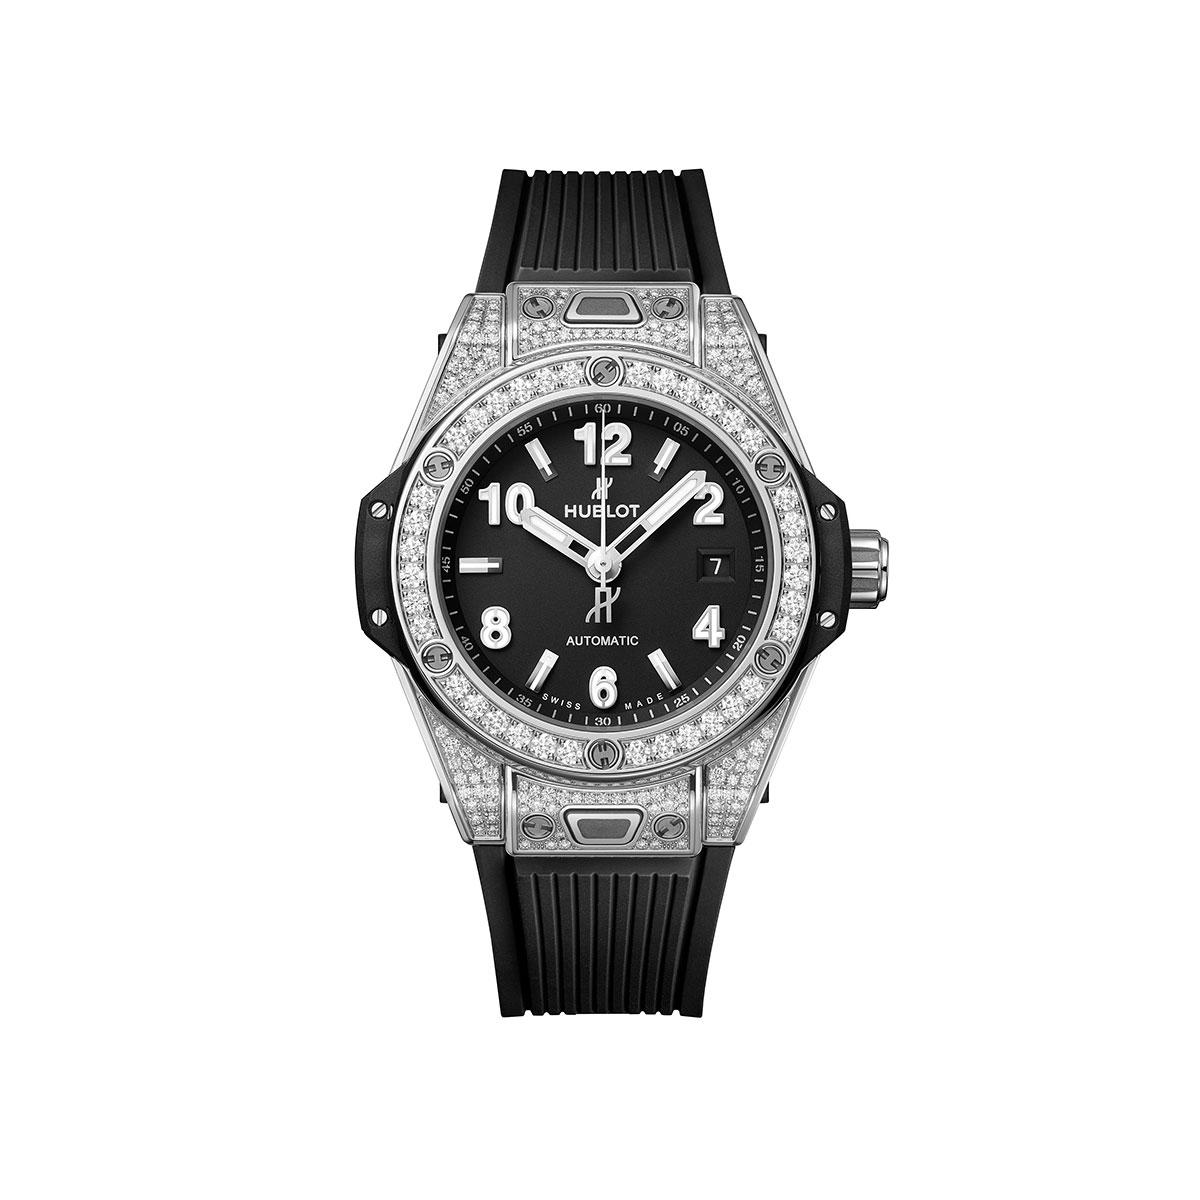 Hublot Big Bang One Click Steel Pave 33mm Watch